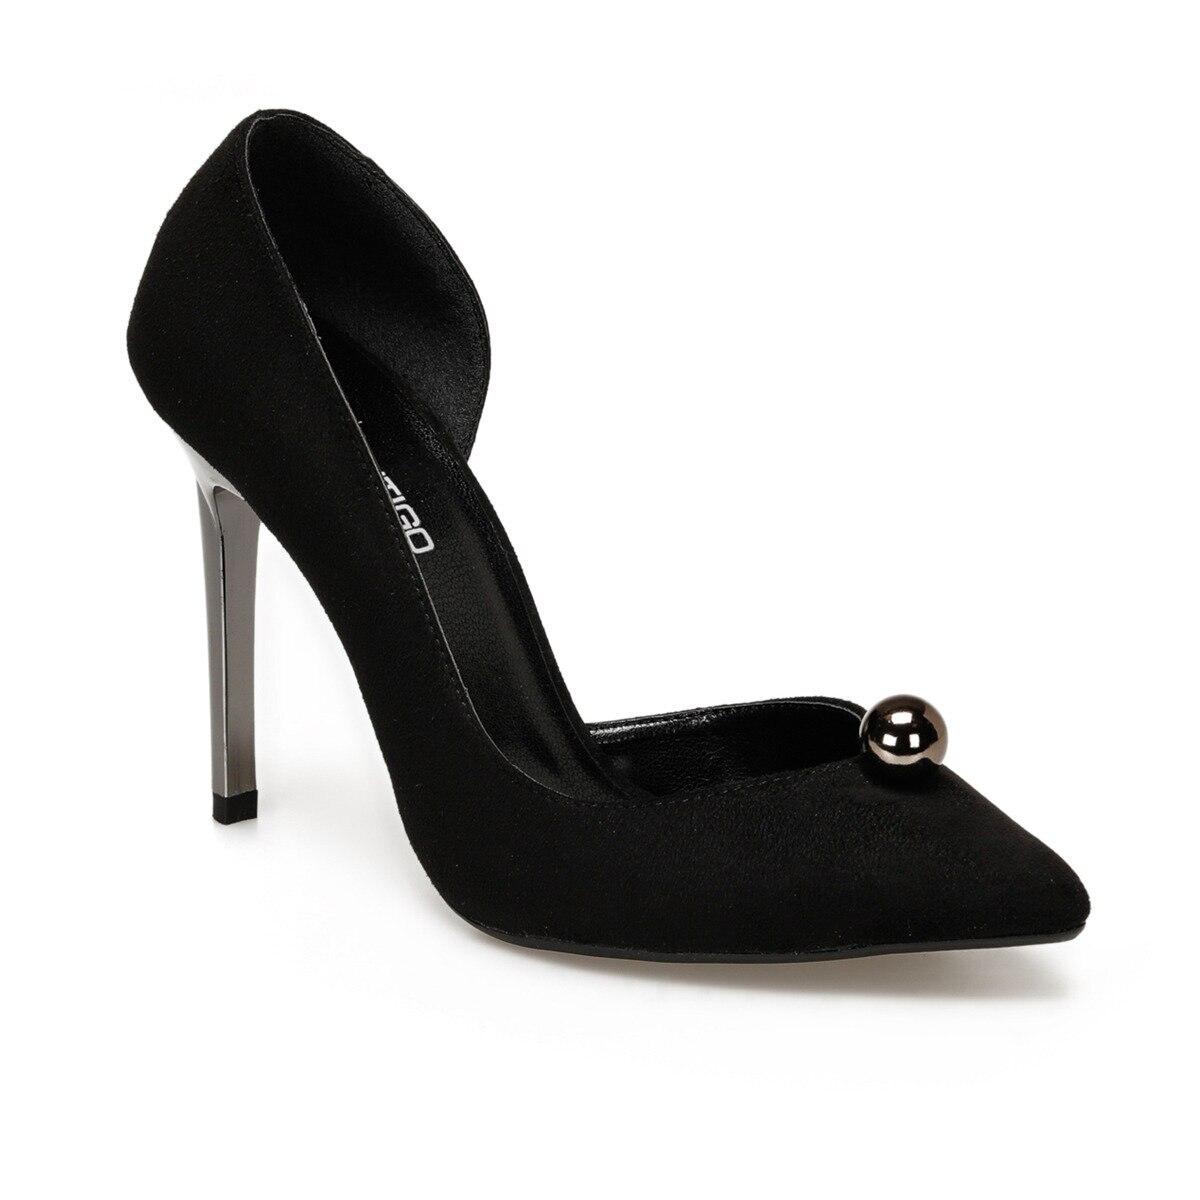 FLO CİLLİAN Black Women Gova Shoes BUTIGO